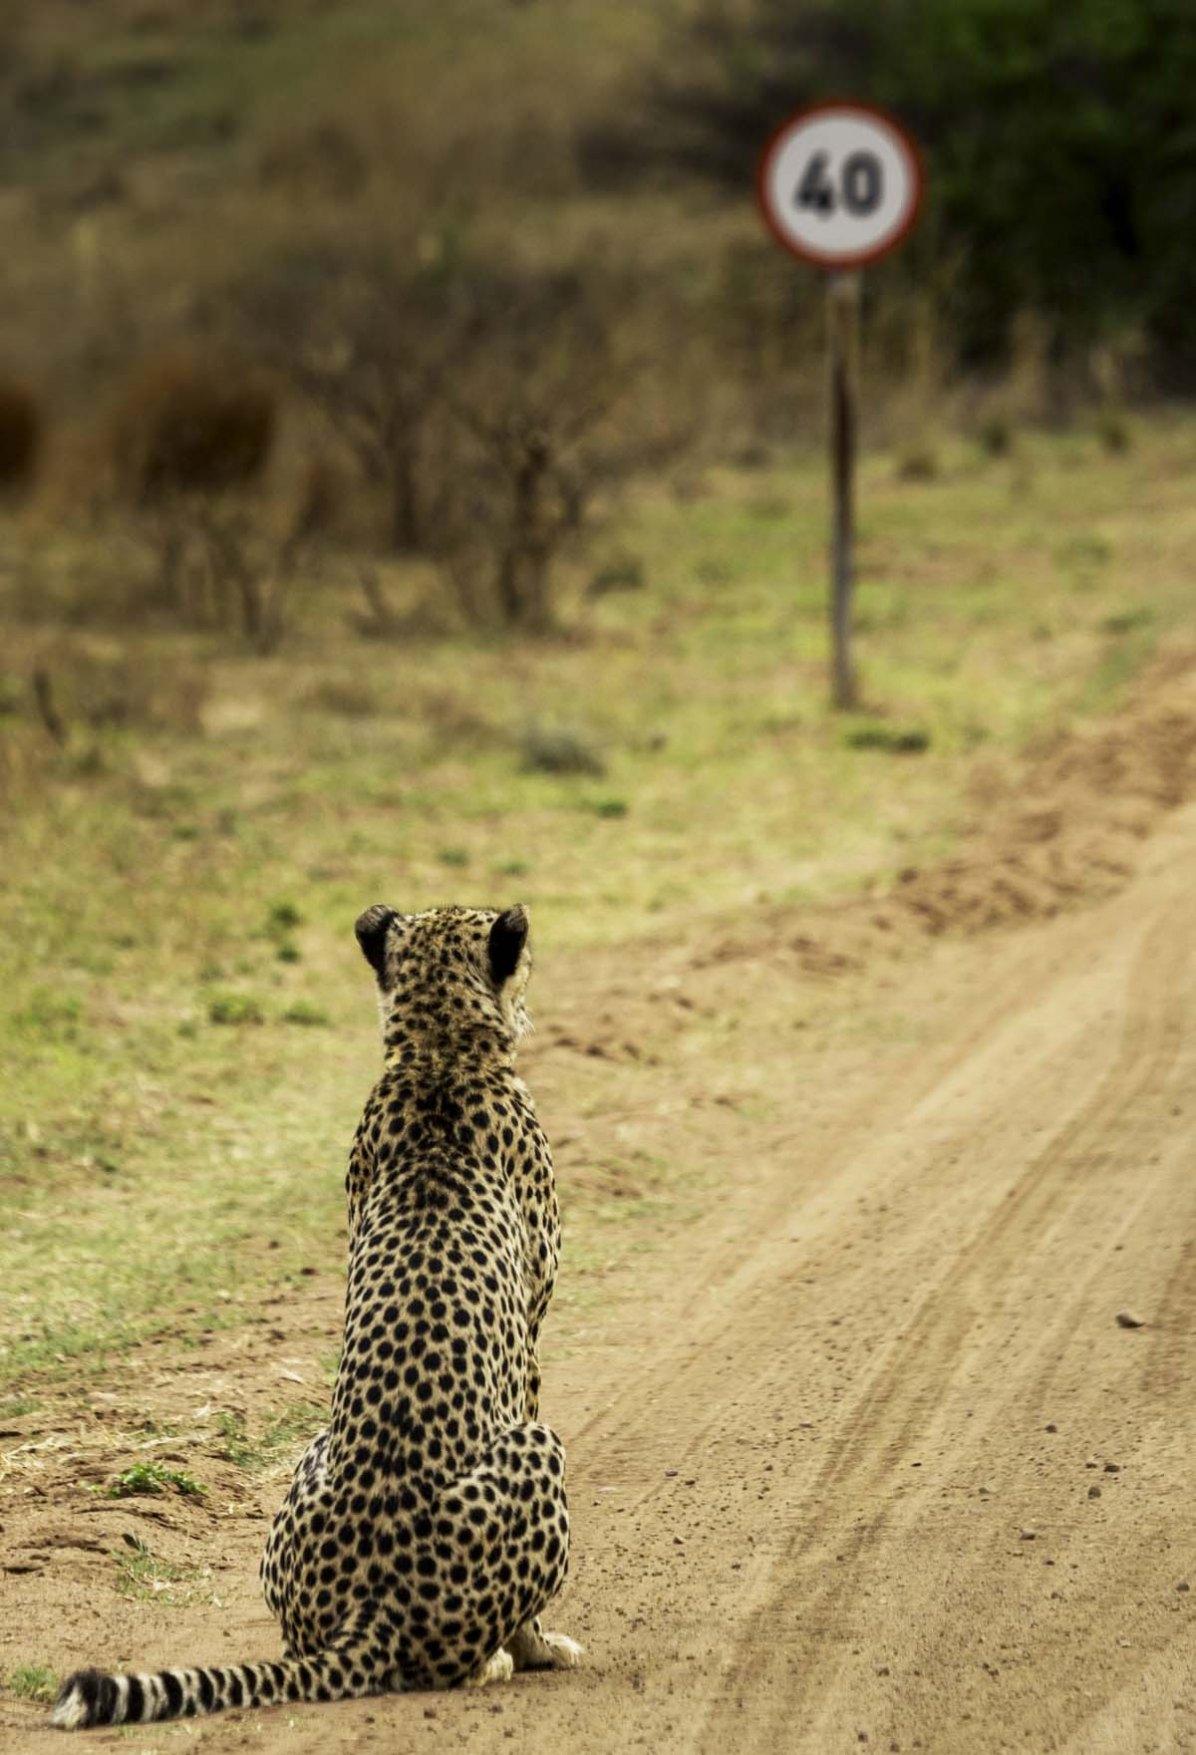 © Vaughan Jessnitz, comedy wildlife photo awards 2016